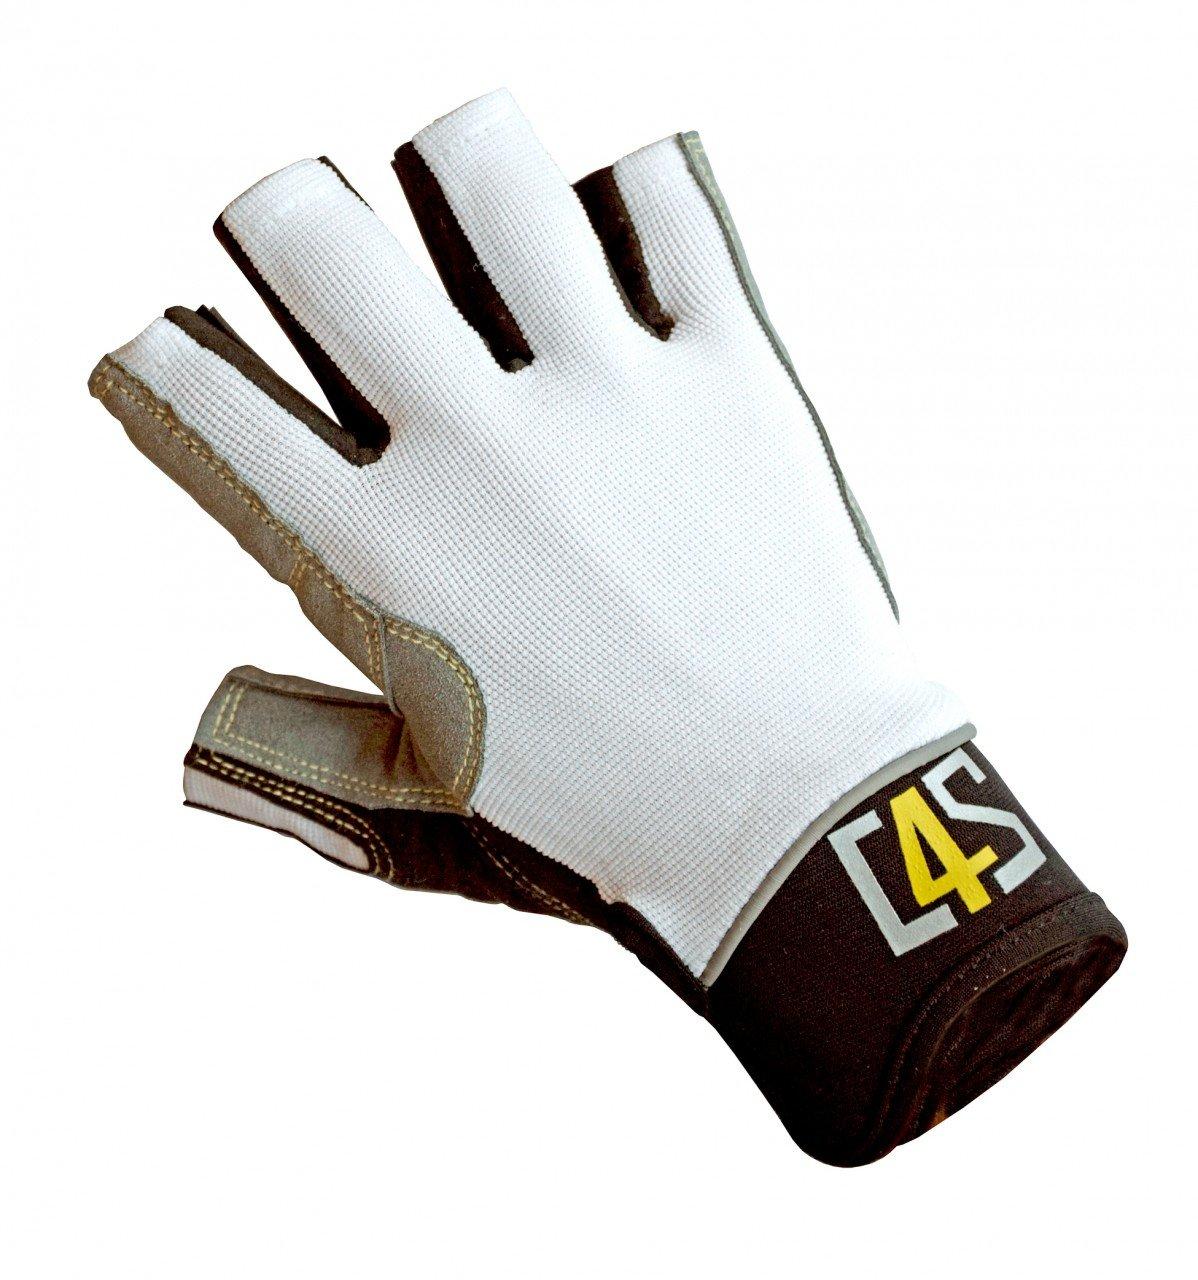 Handschuhe crazy4sailing Amara Kunstleder Segelhandschuhe Racing 5 Finger frei Segeln Glove